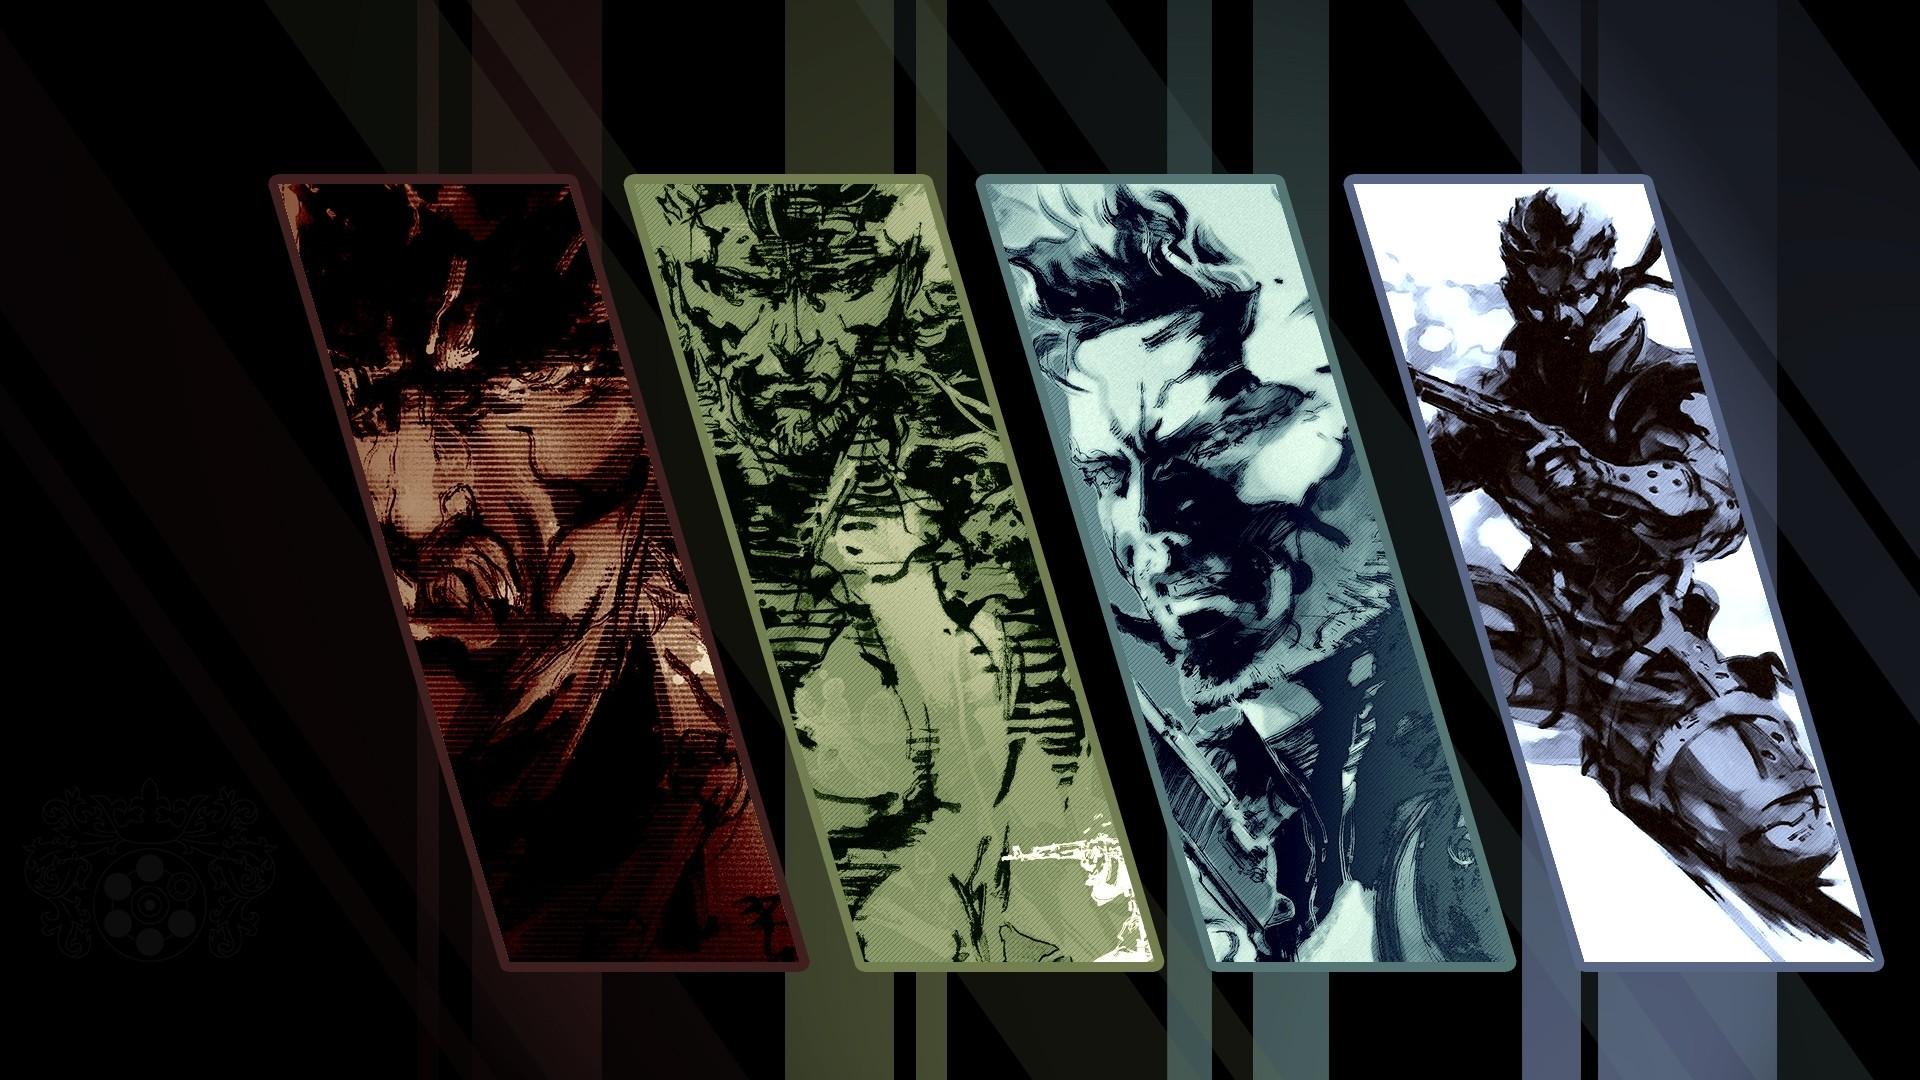 Wallpaper 1920x1080 Px Metal Gear Solid 1920x1080 Wallhaven